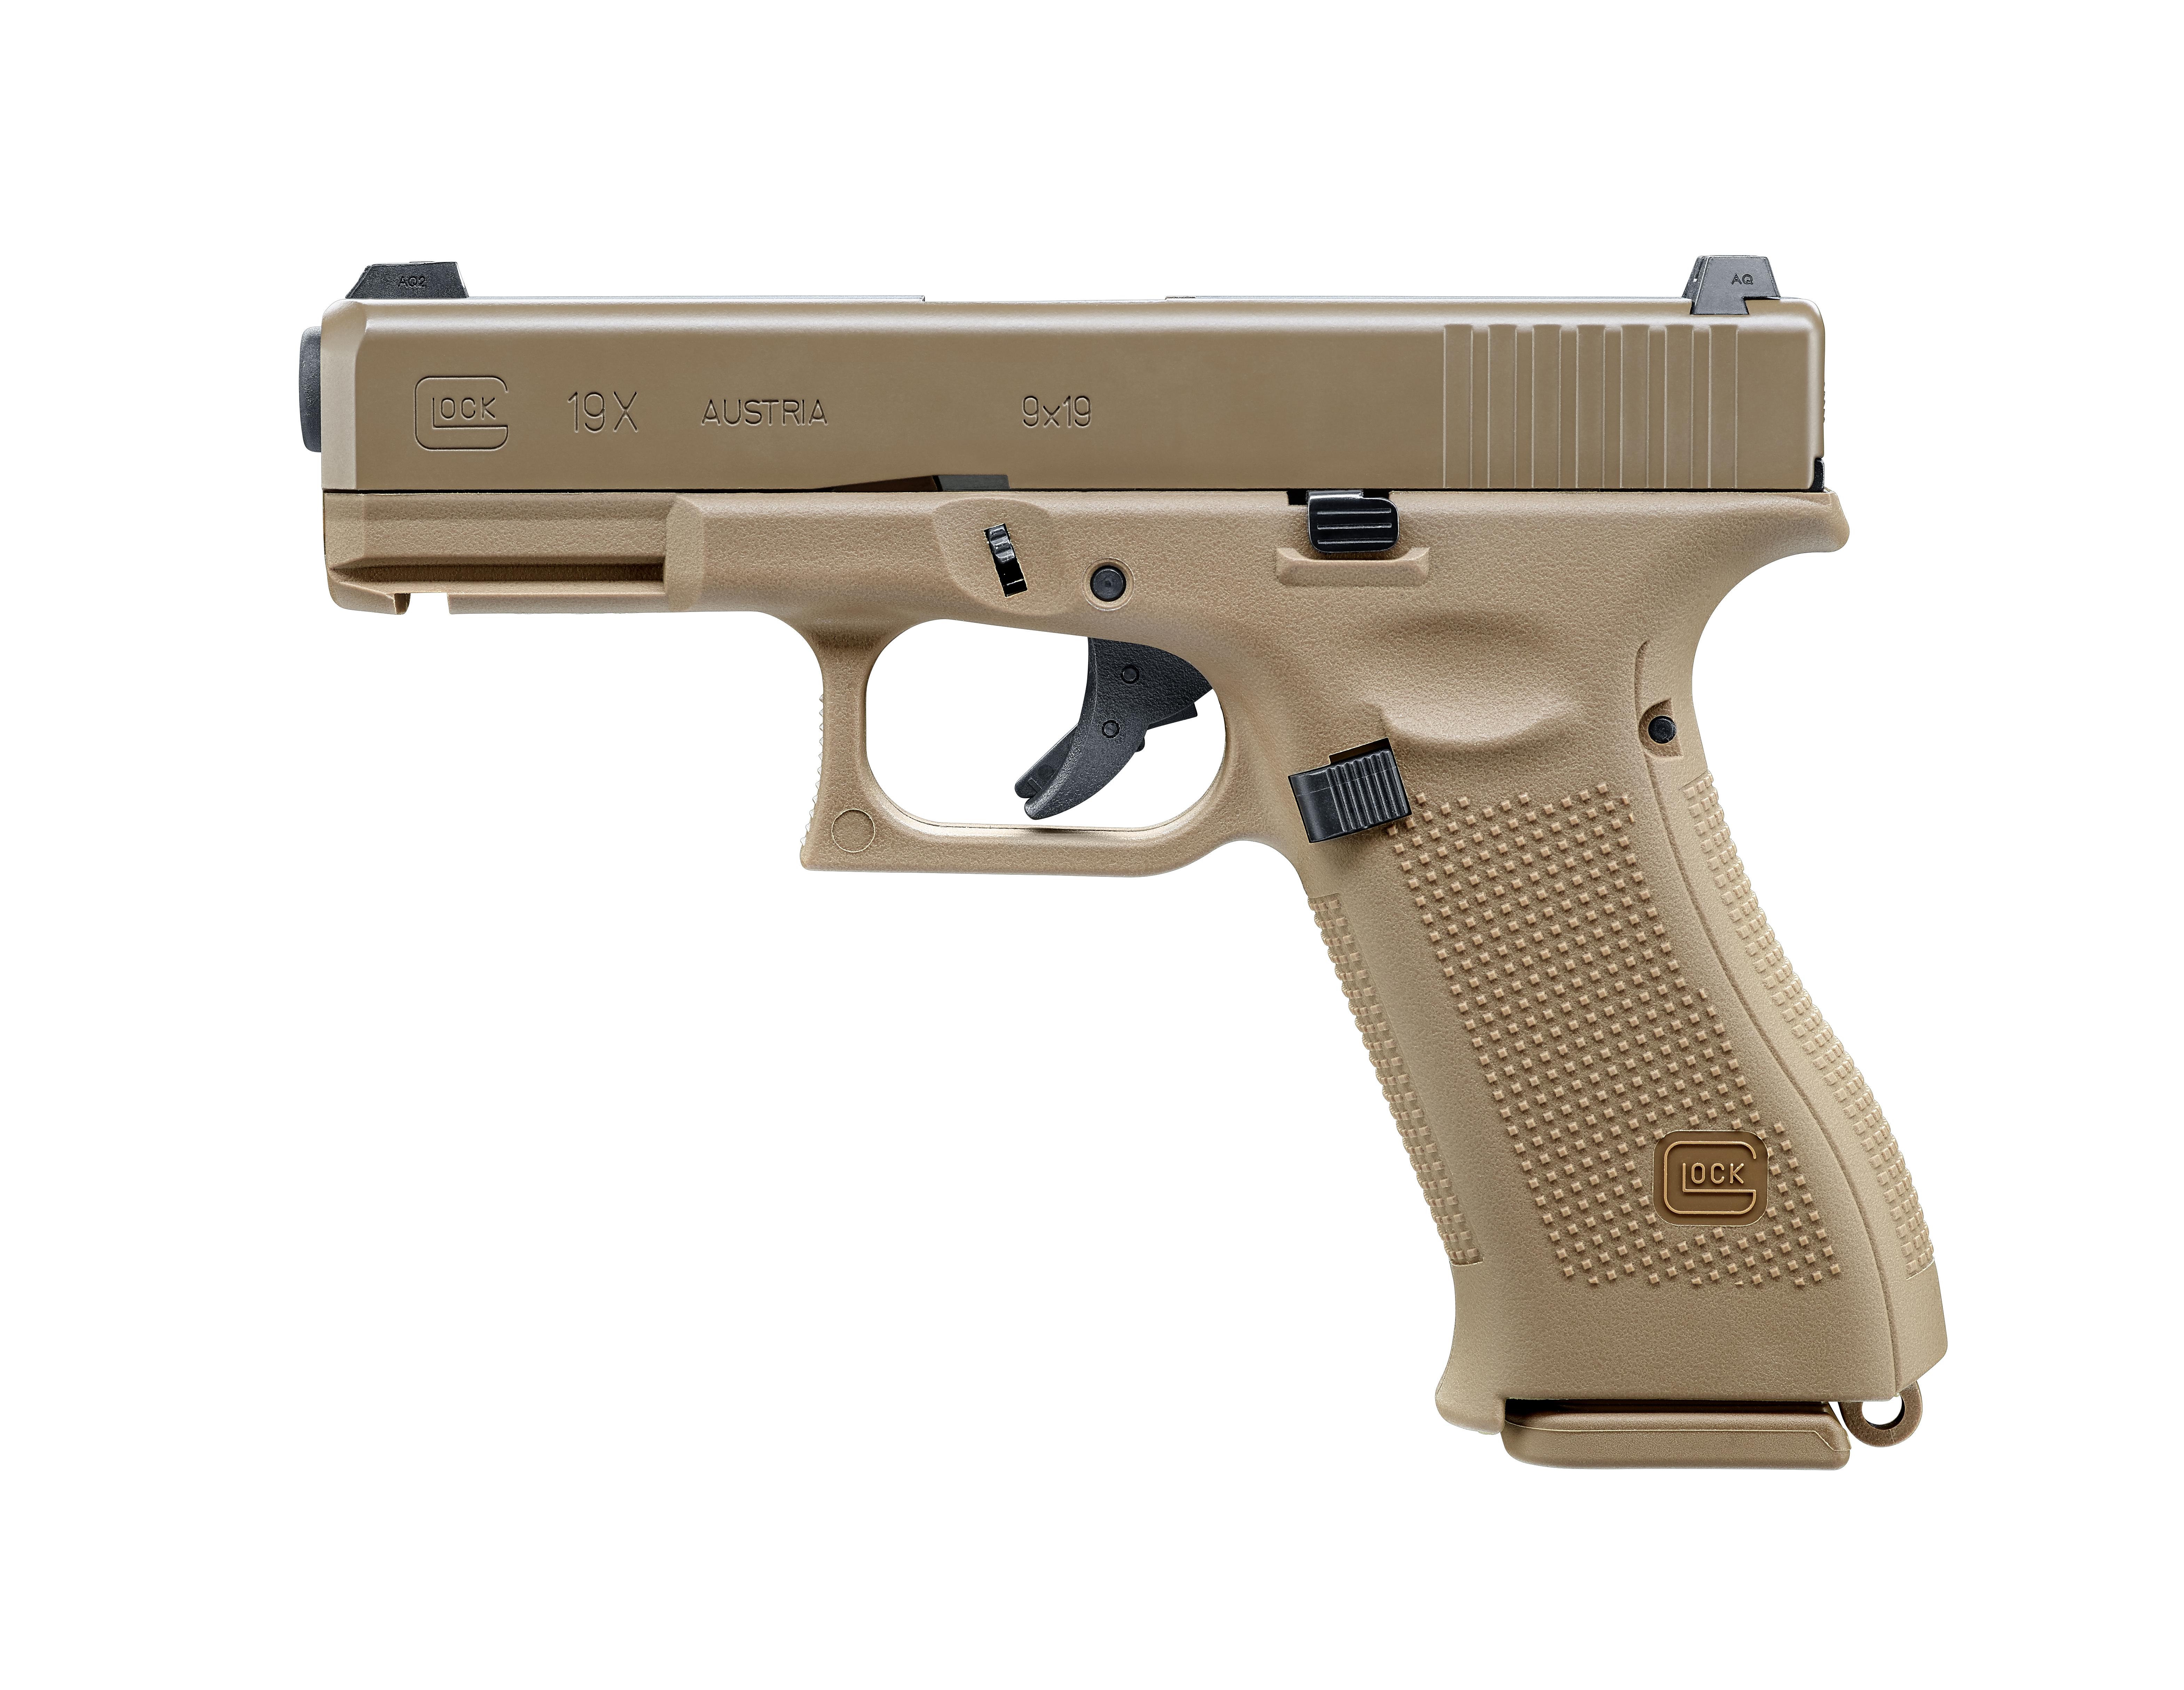 GLOCK (Umarex) Airsoft GBB Glock 19X